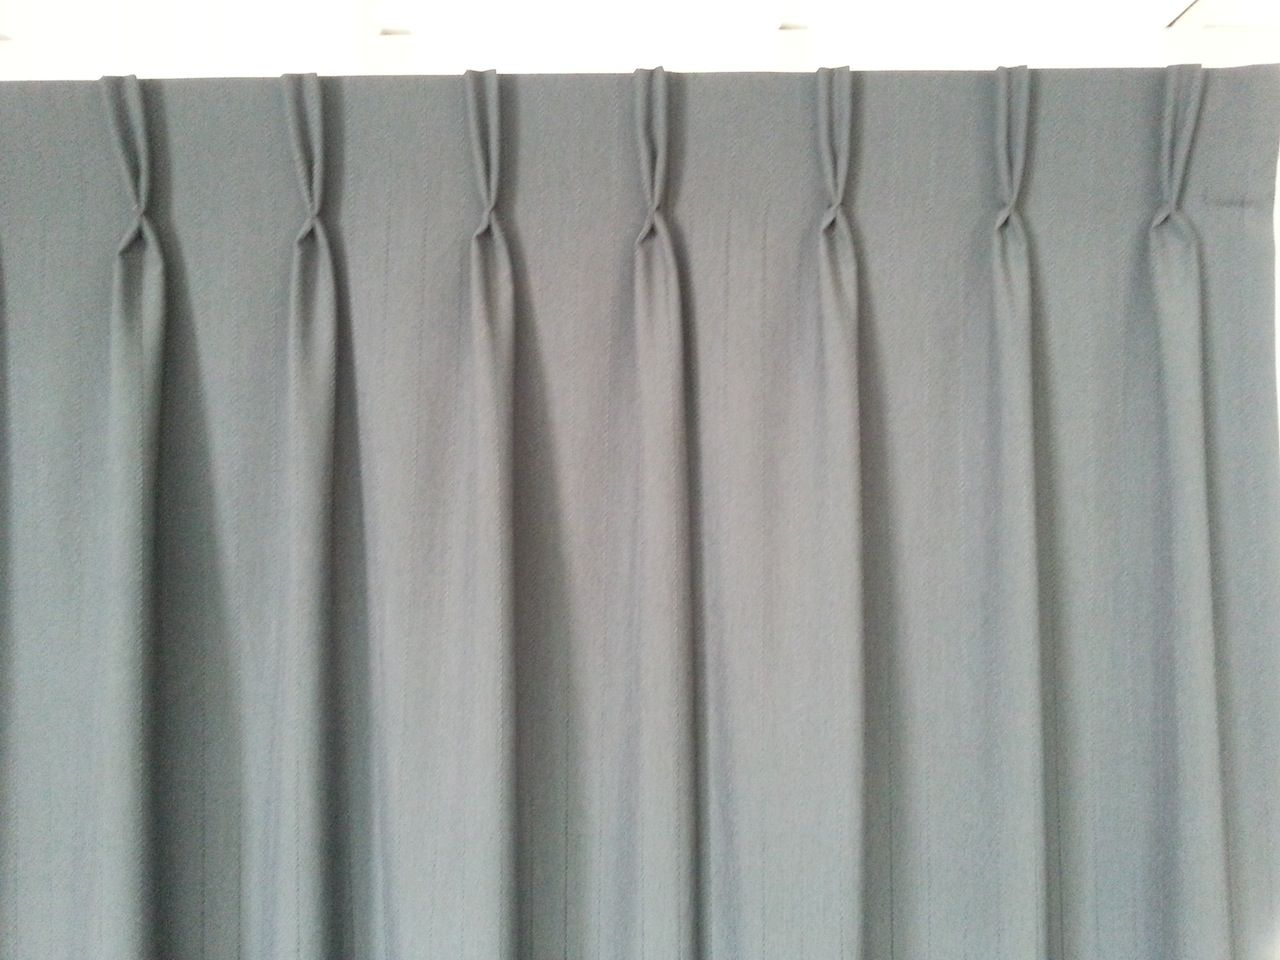 Curtain pleats integralbookcom for Types of pleat curtains